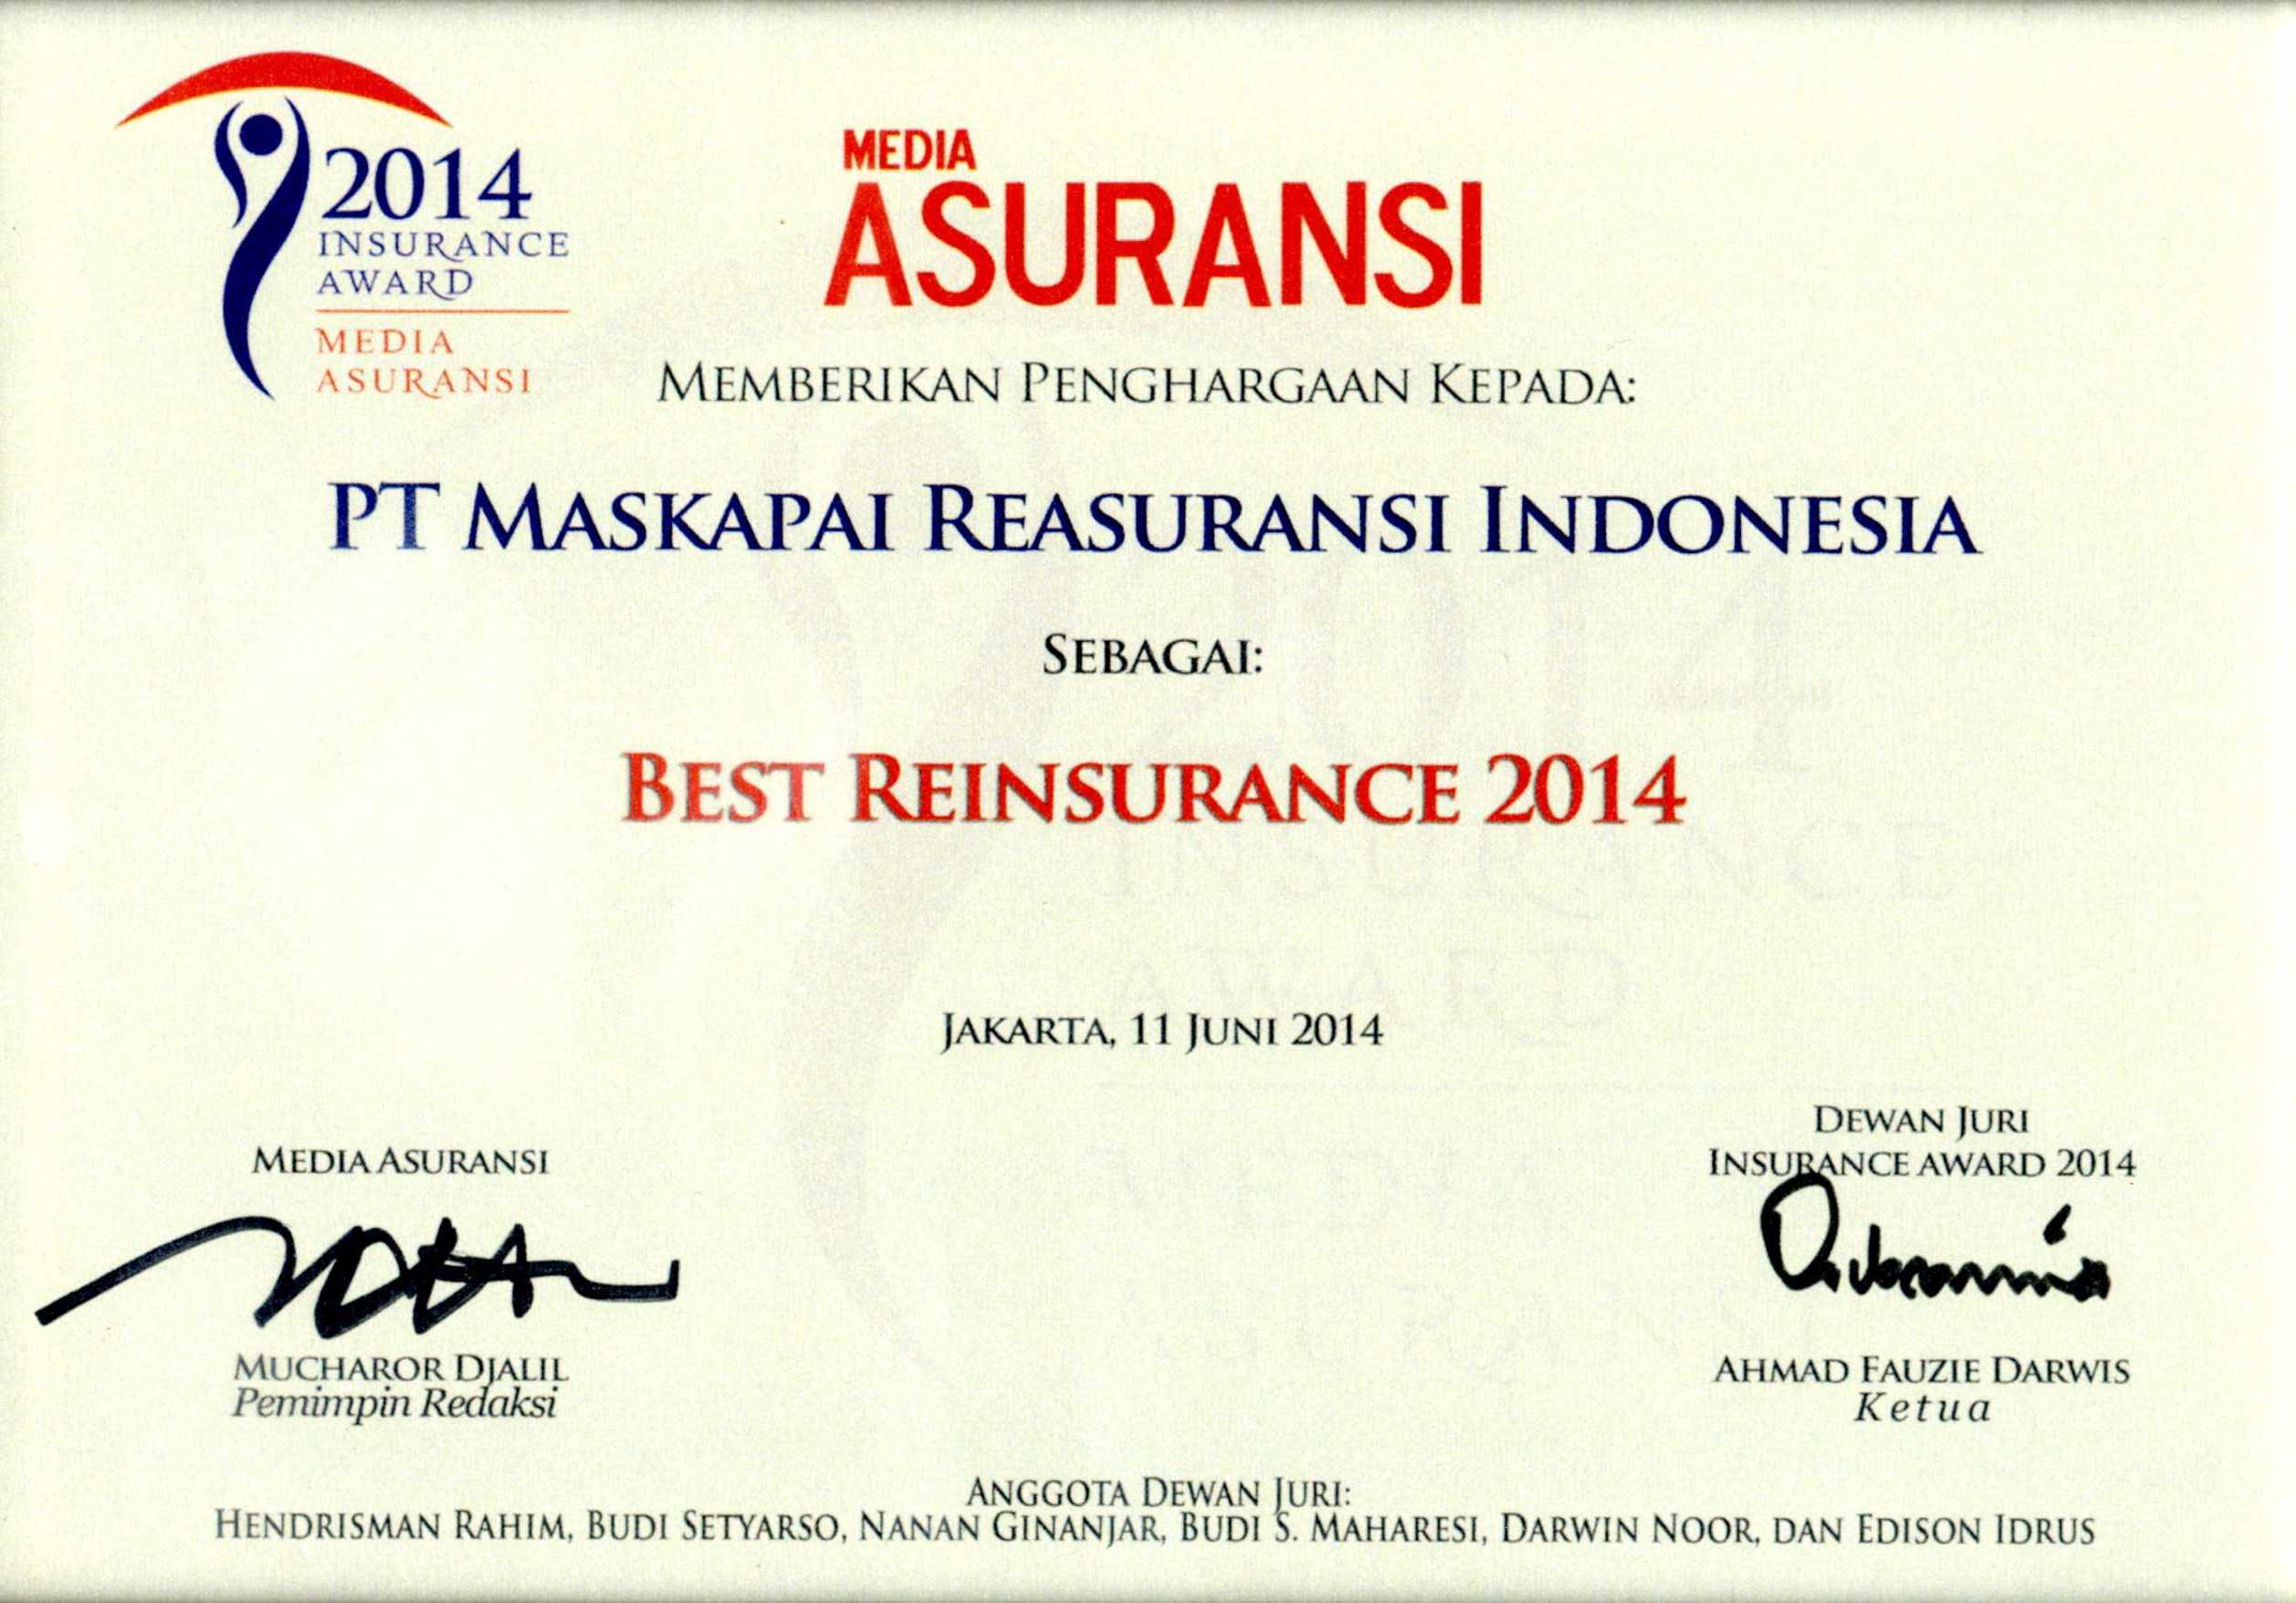 Majalah Media Asuransi : Best Reinsurance 2014